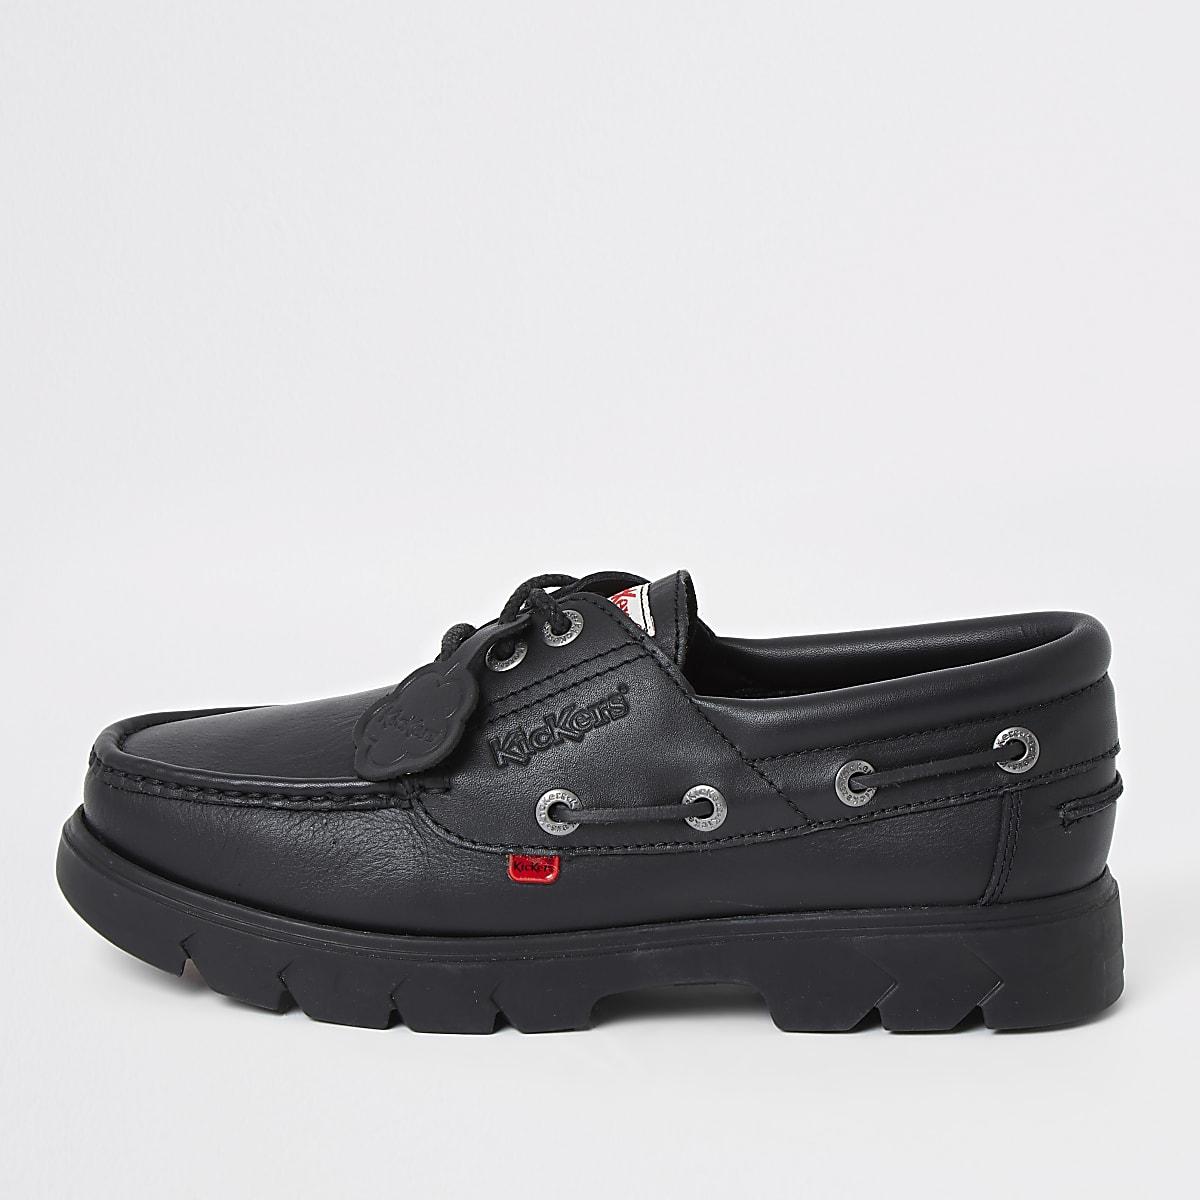 Kickers - Lennon - Zwarte leren bootschoenen